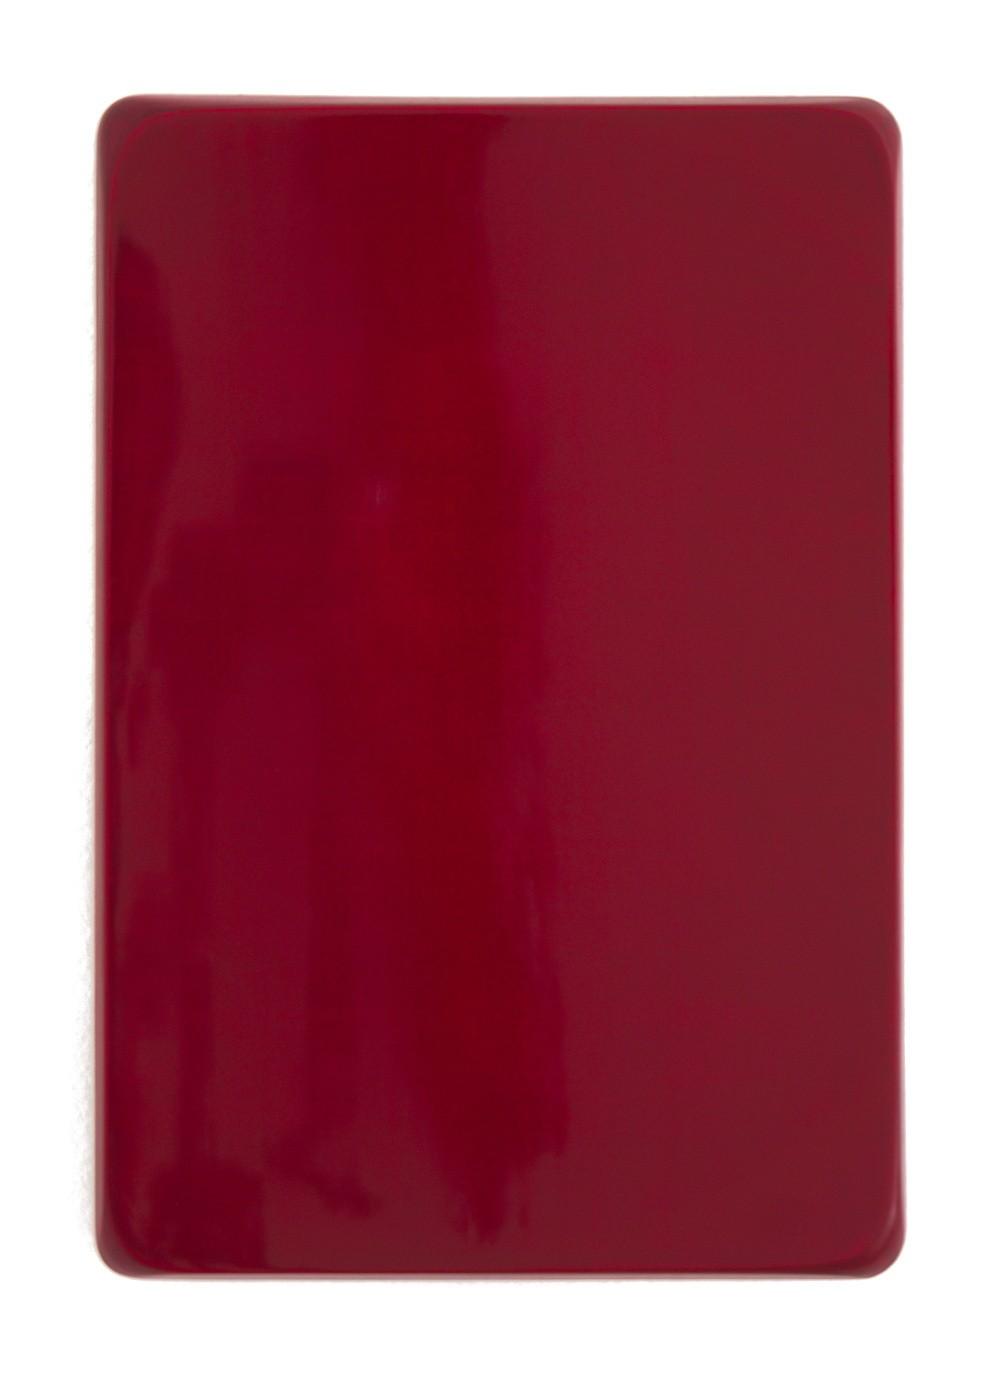 o.T. / Neutralgrau, Alizarin- Karmesin, Chinacridonviolett, Rubinrot, Aquarell auf Gips und Medium, 35 x 25 cm, 2013